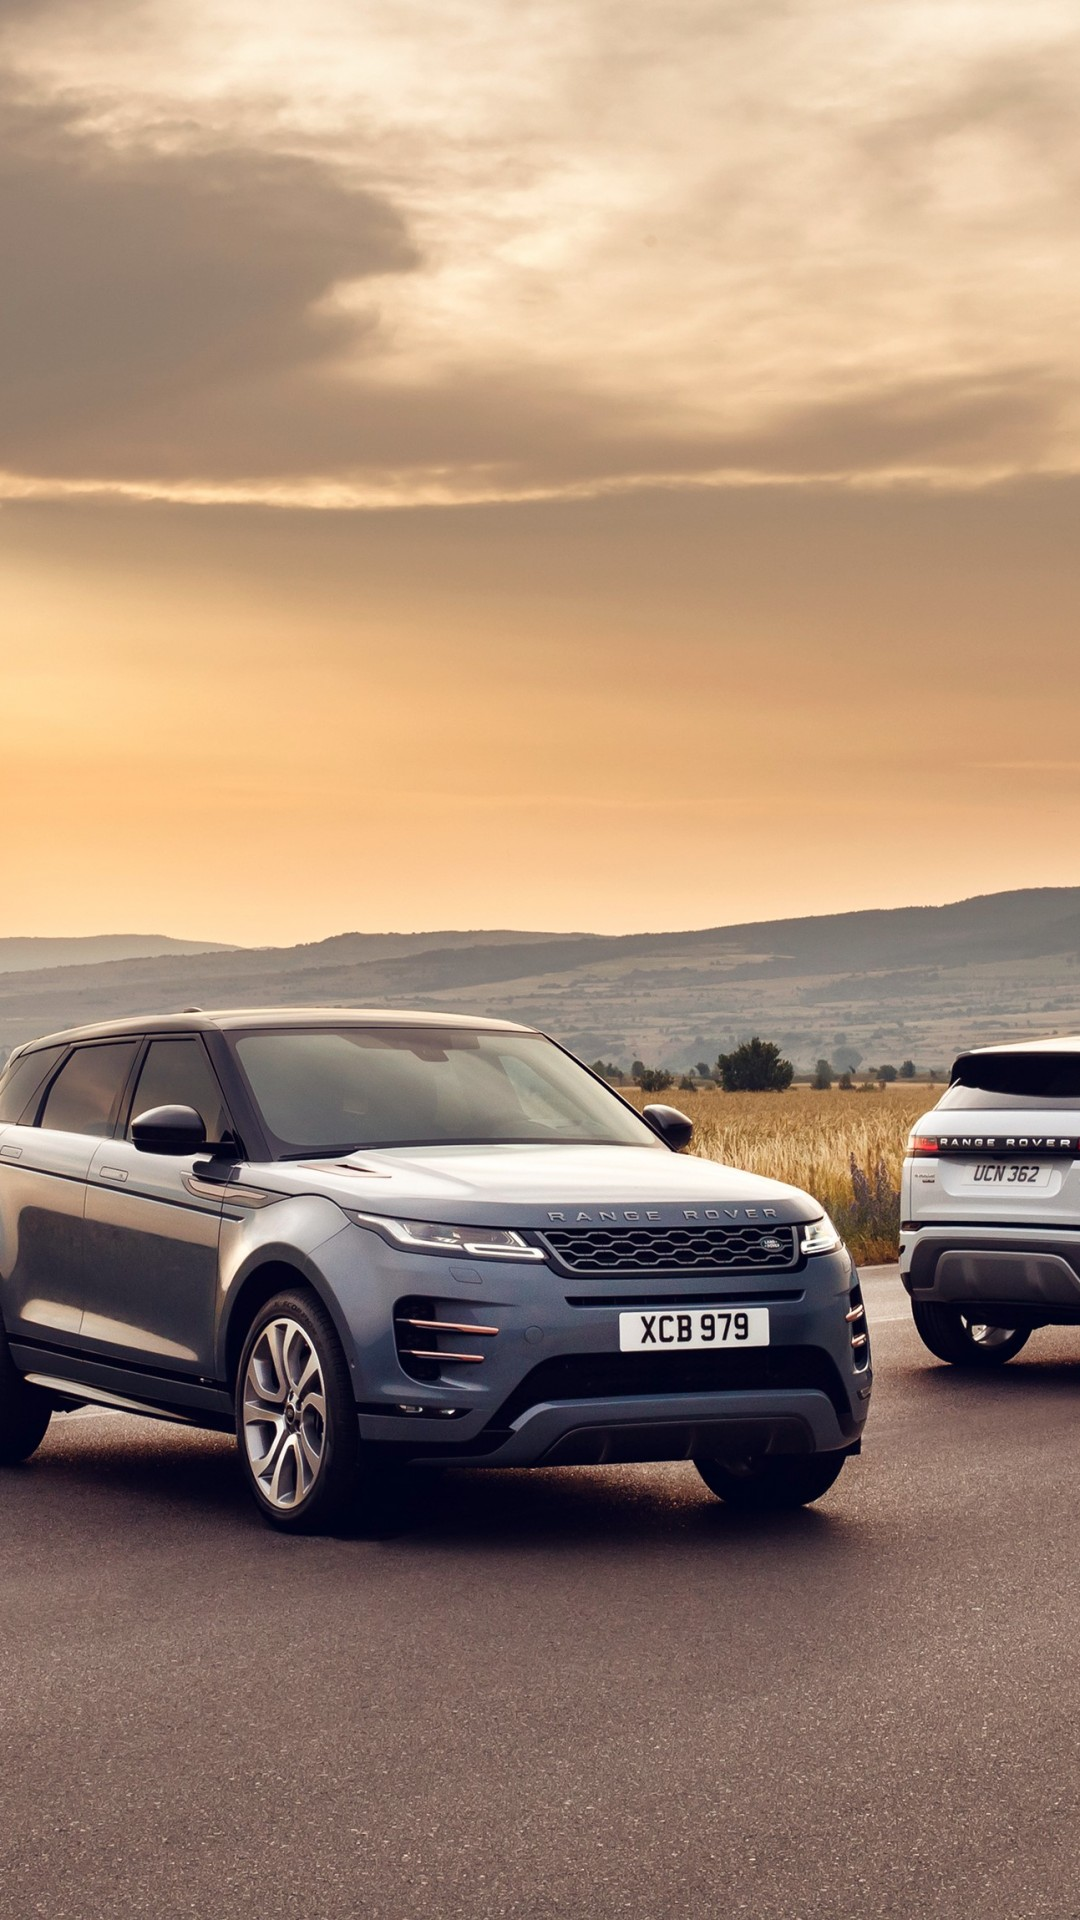 Range Rover Evoke >> Wallpaper Range Rover Evoque, SUV, 2019 Cars, 4K, Cars & Bikes #20941